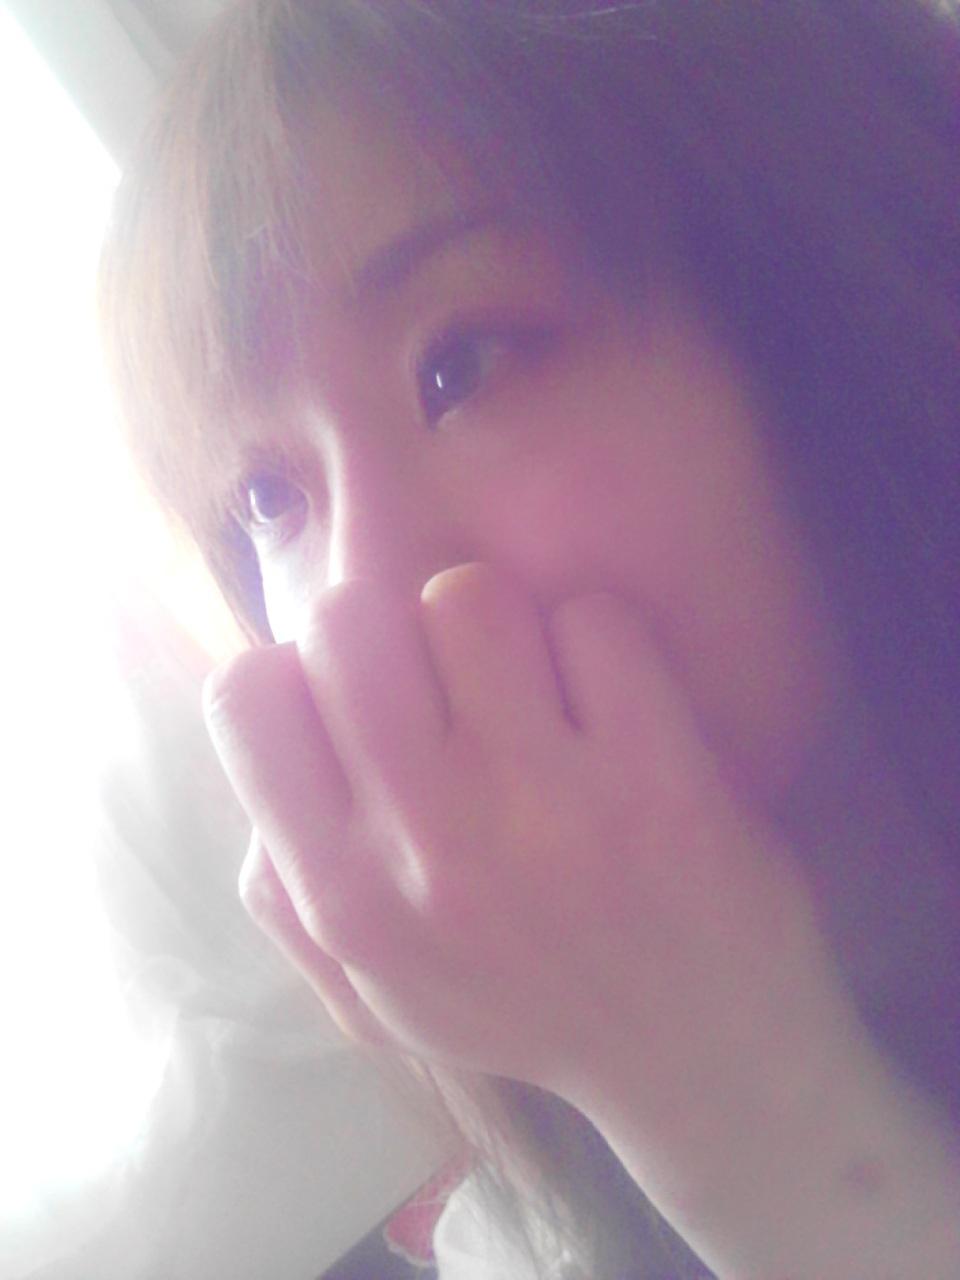 saaya11 - Japanese webcam girl